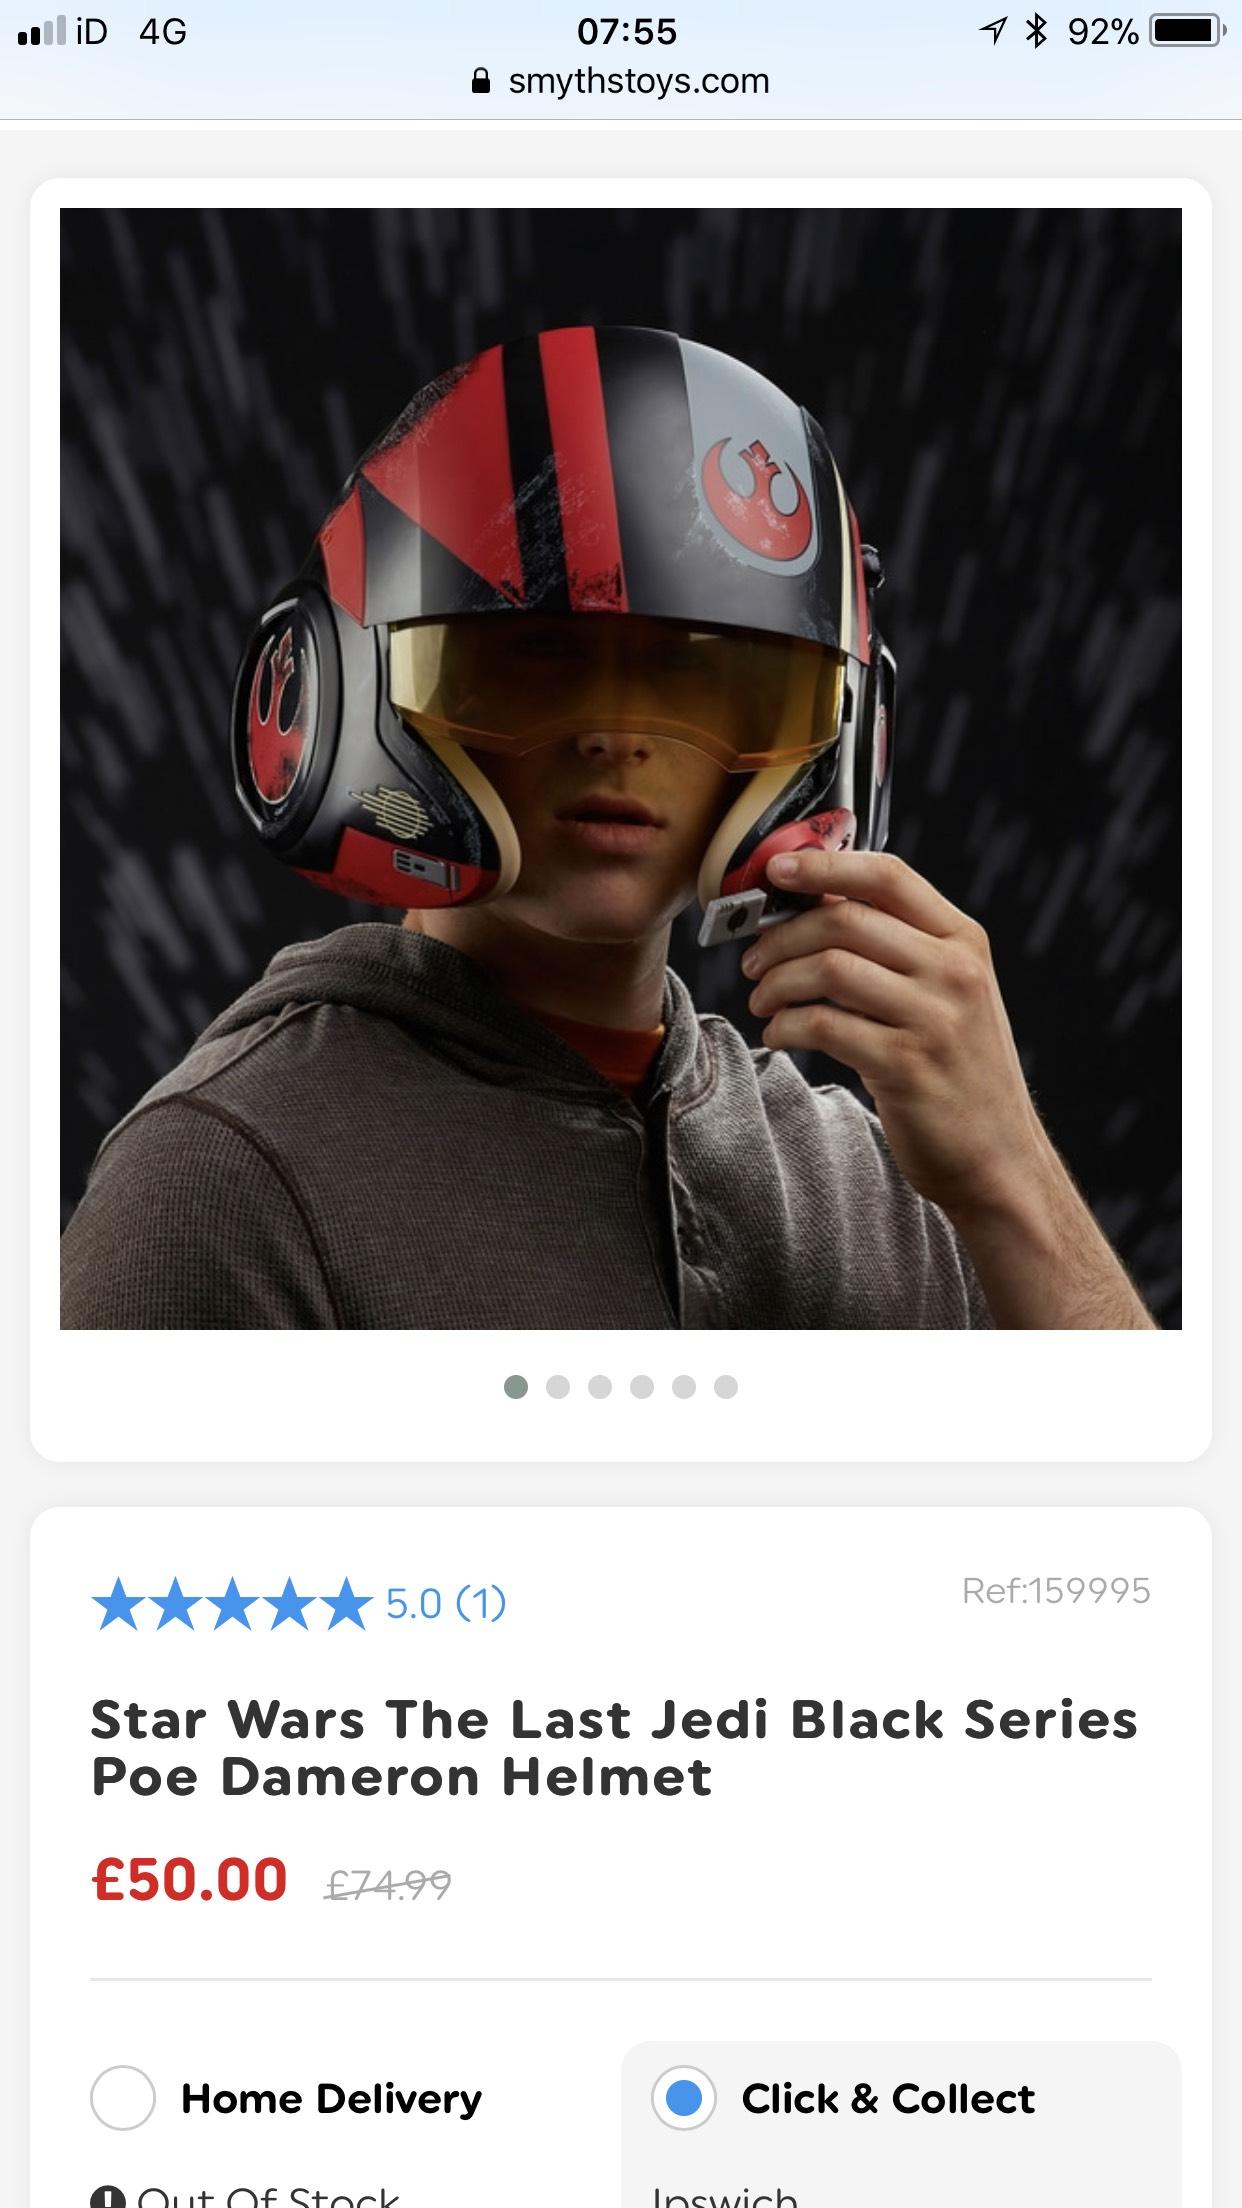 Black series Poe Dameron Star Wars helmet - £50 @ Smyths Toys (free C&C)